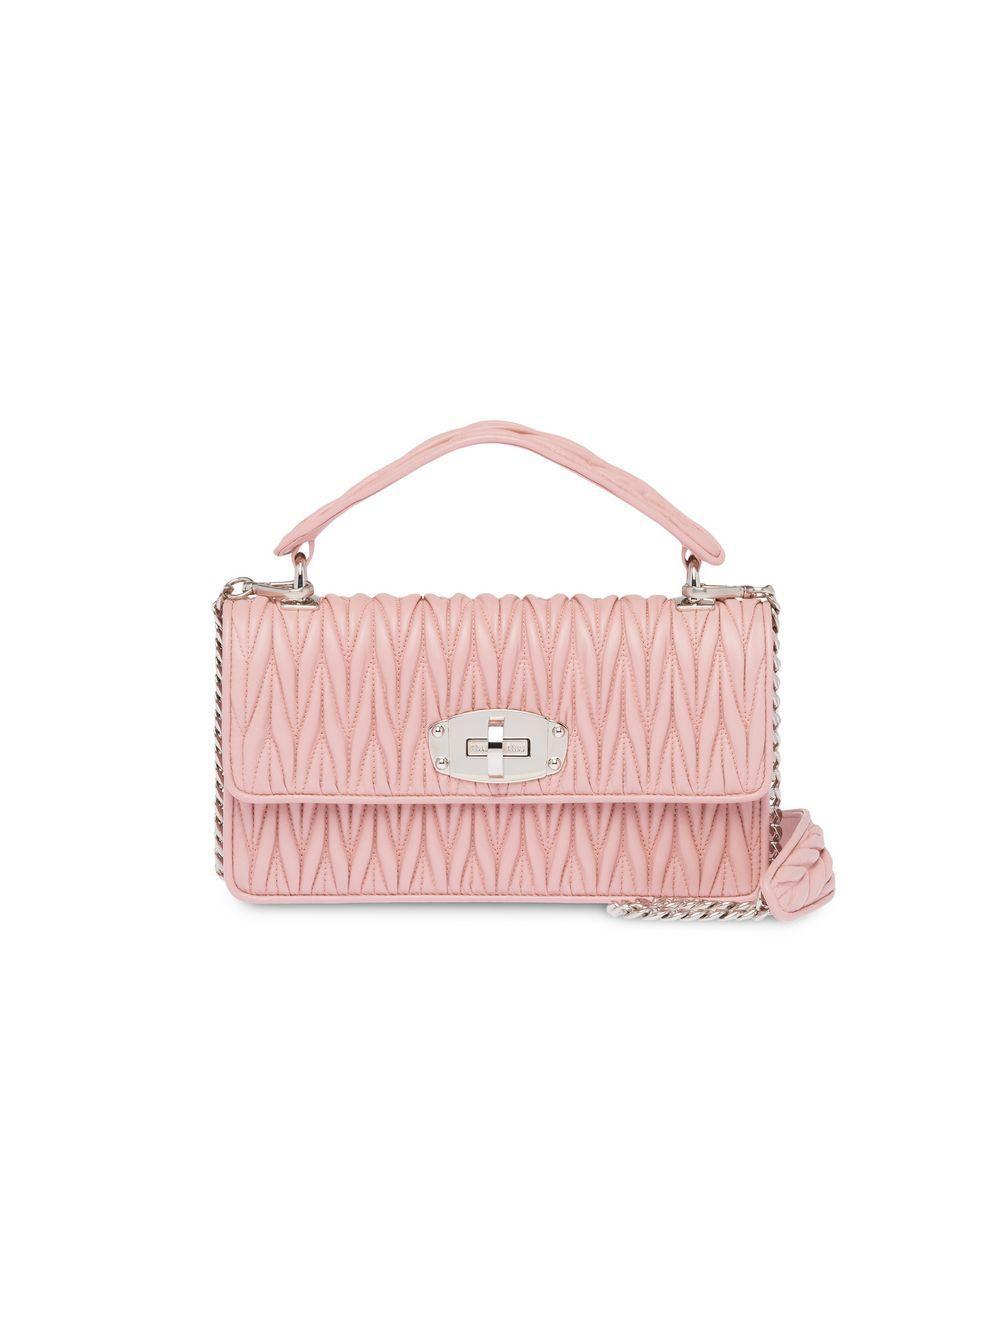 0680b647369 Lyst - Miu Miu Miu Cleo Matelassé Bag in Pink